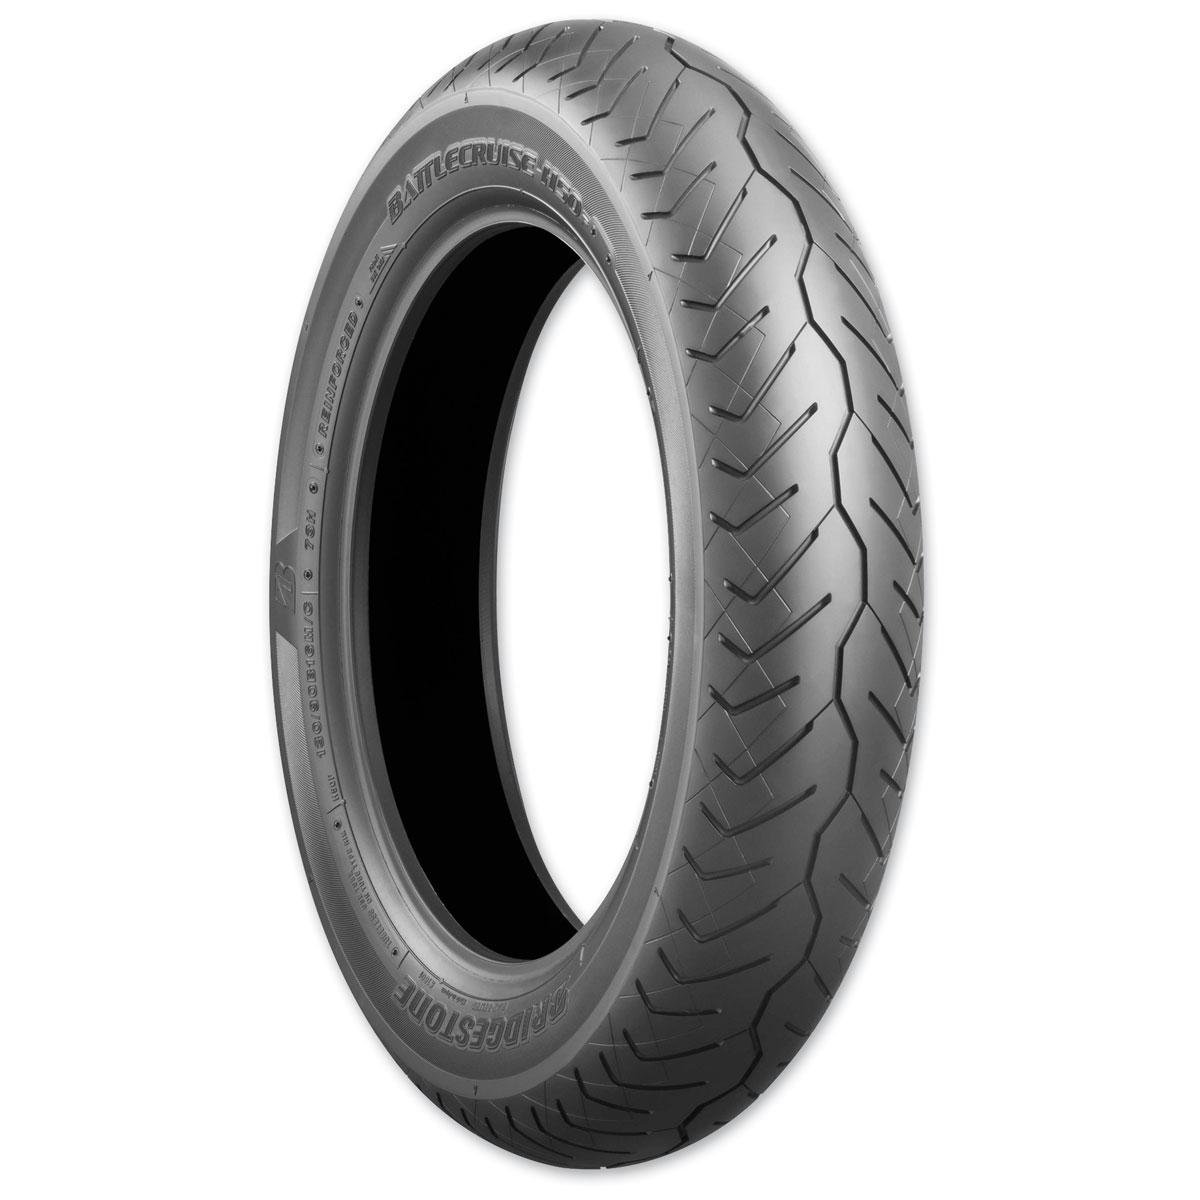 Bridgestone Battlecruise H50 180/65B16 Rear Tire